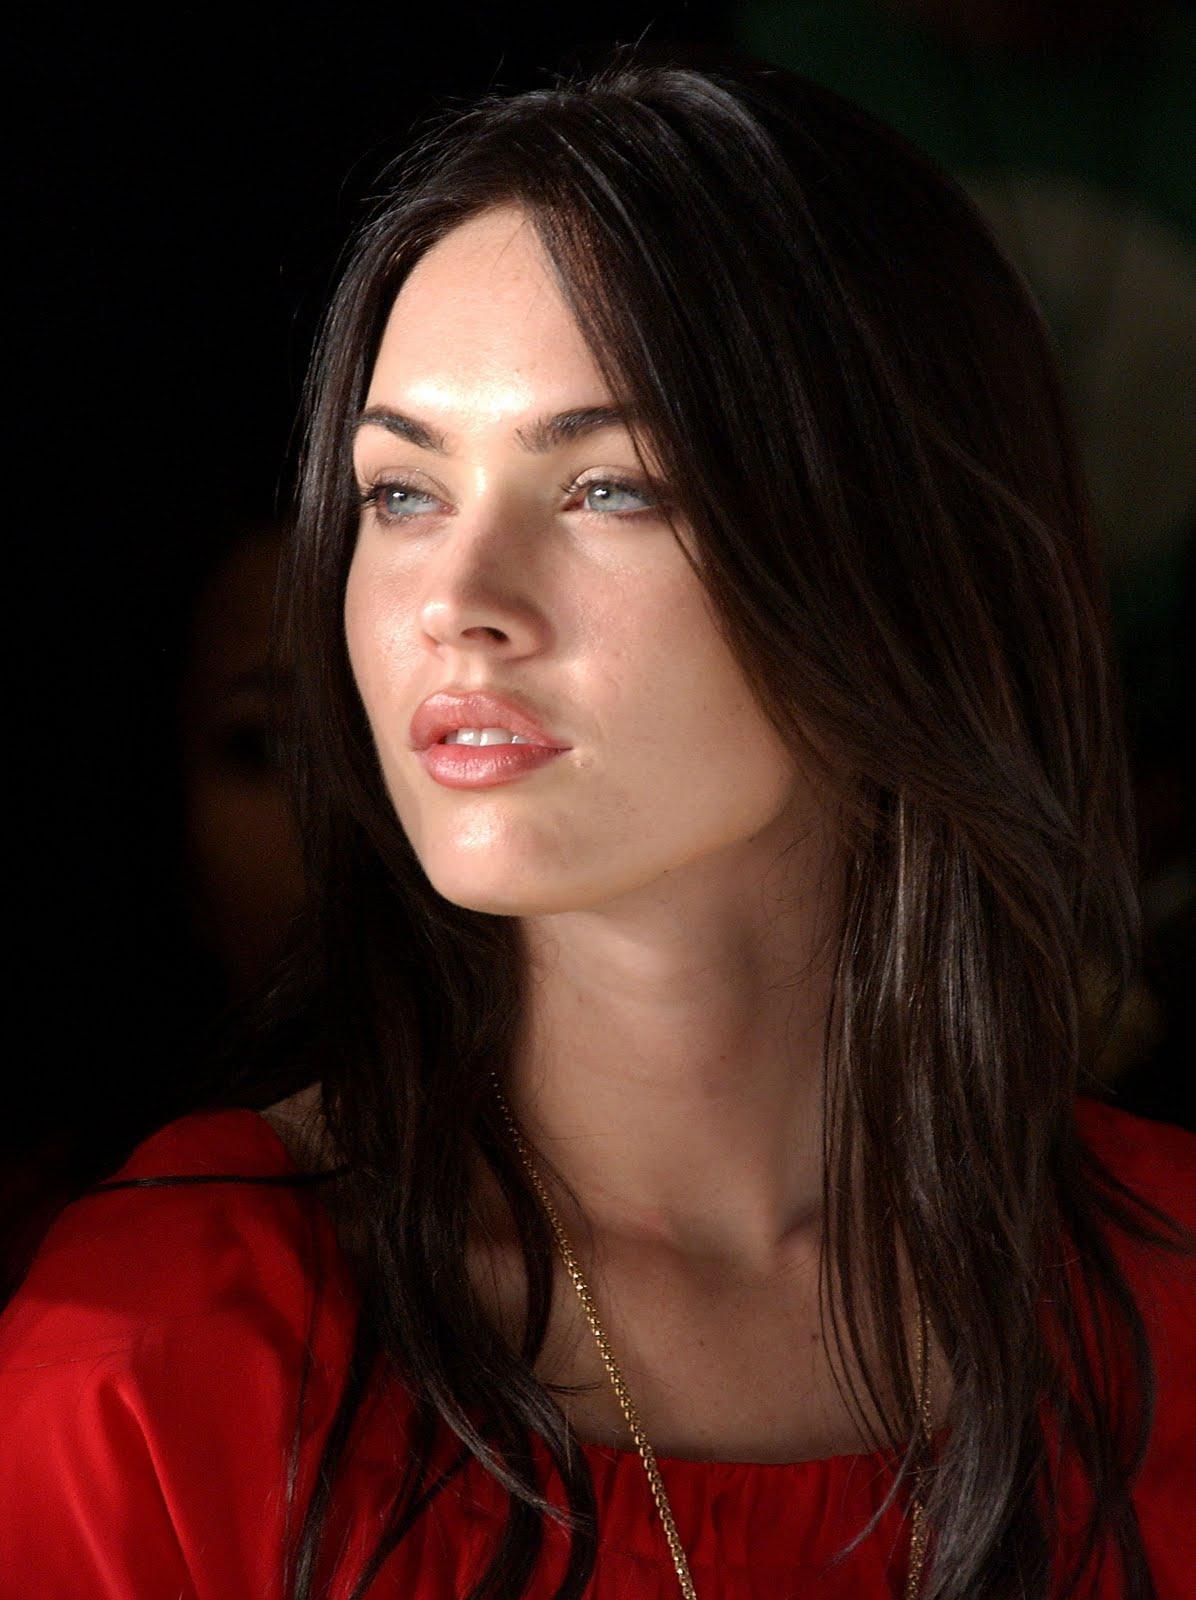 a new life hartz: Megan Fox Long soft Hairstyle